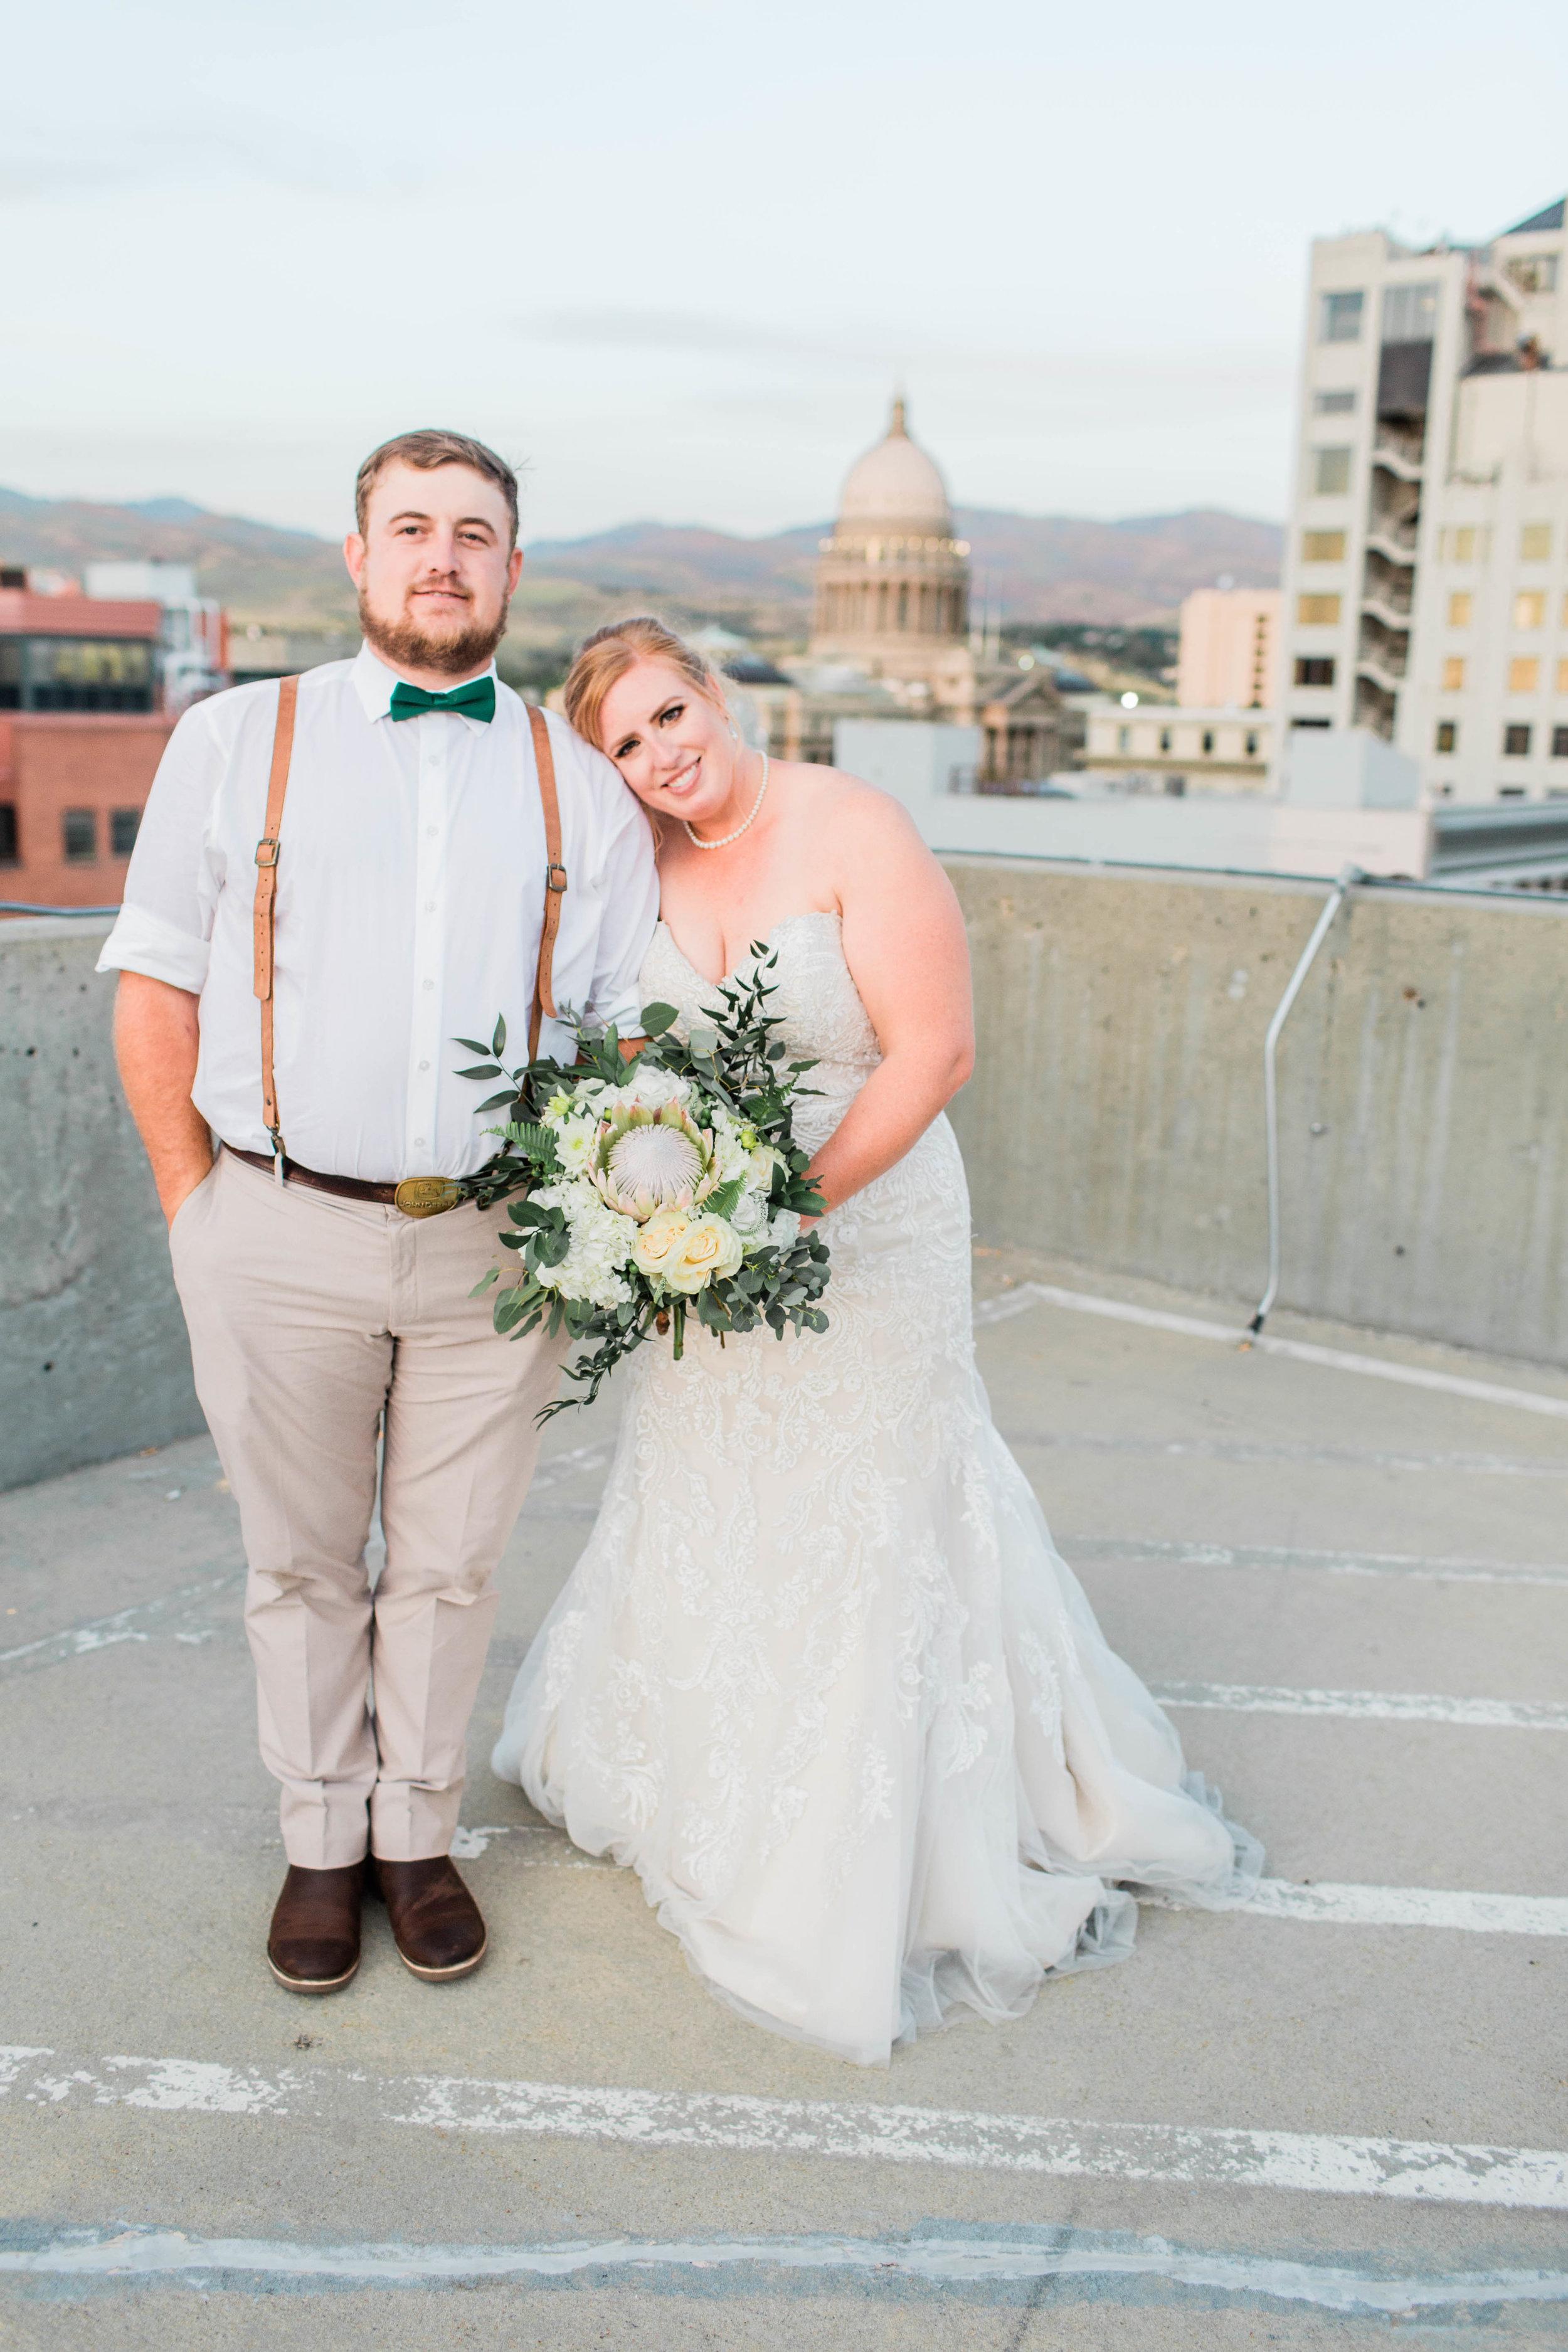 E-Lydia-Rohan-Downtown-Boise-Wedding-23.jpg